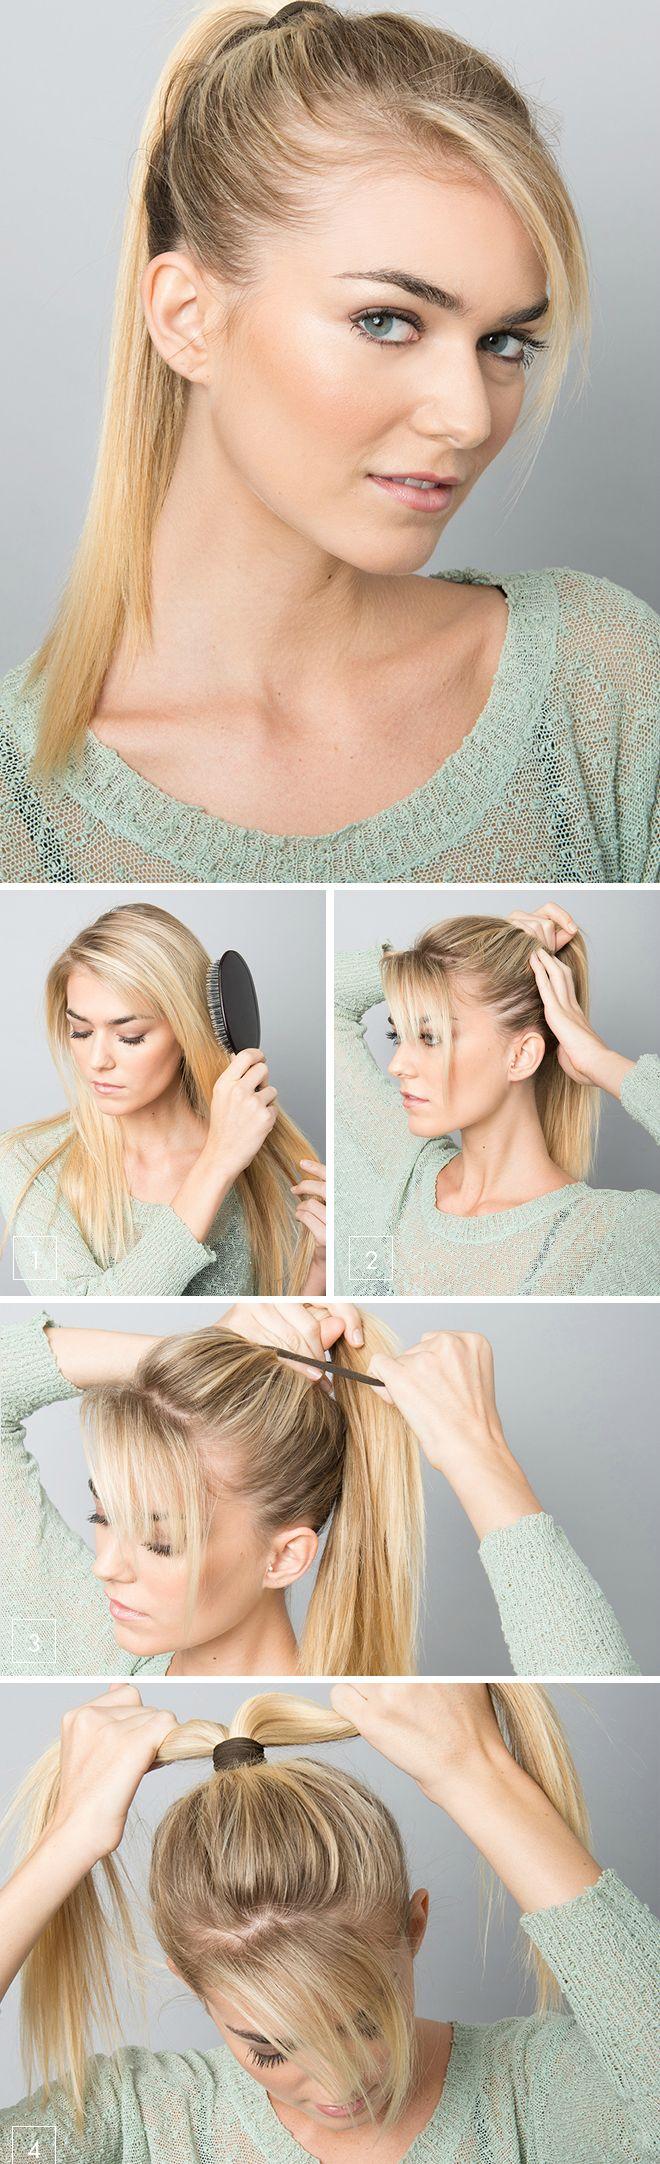 How to fake a fishbone braid fryzury pinterest